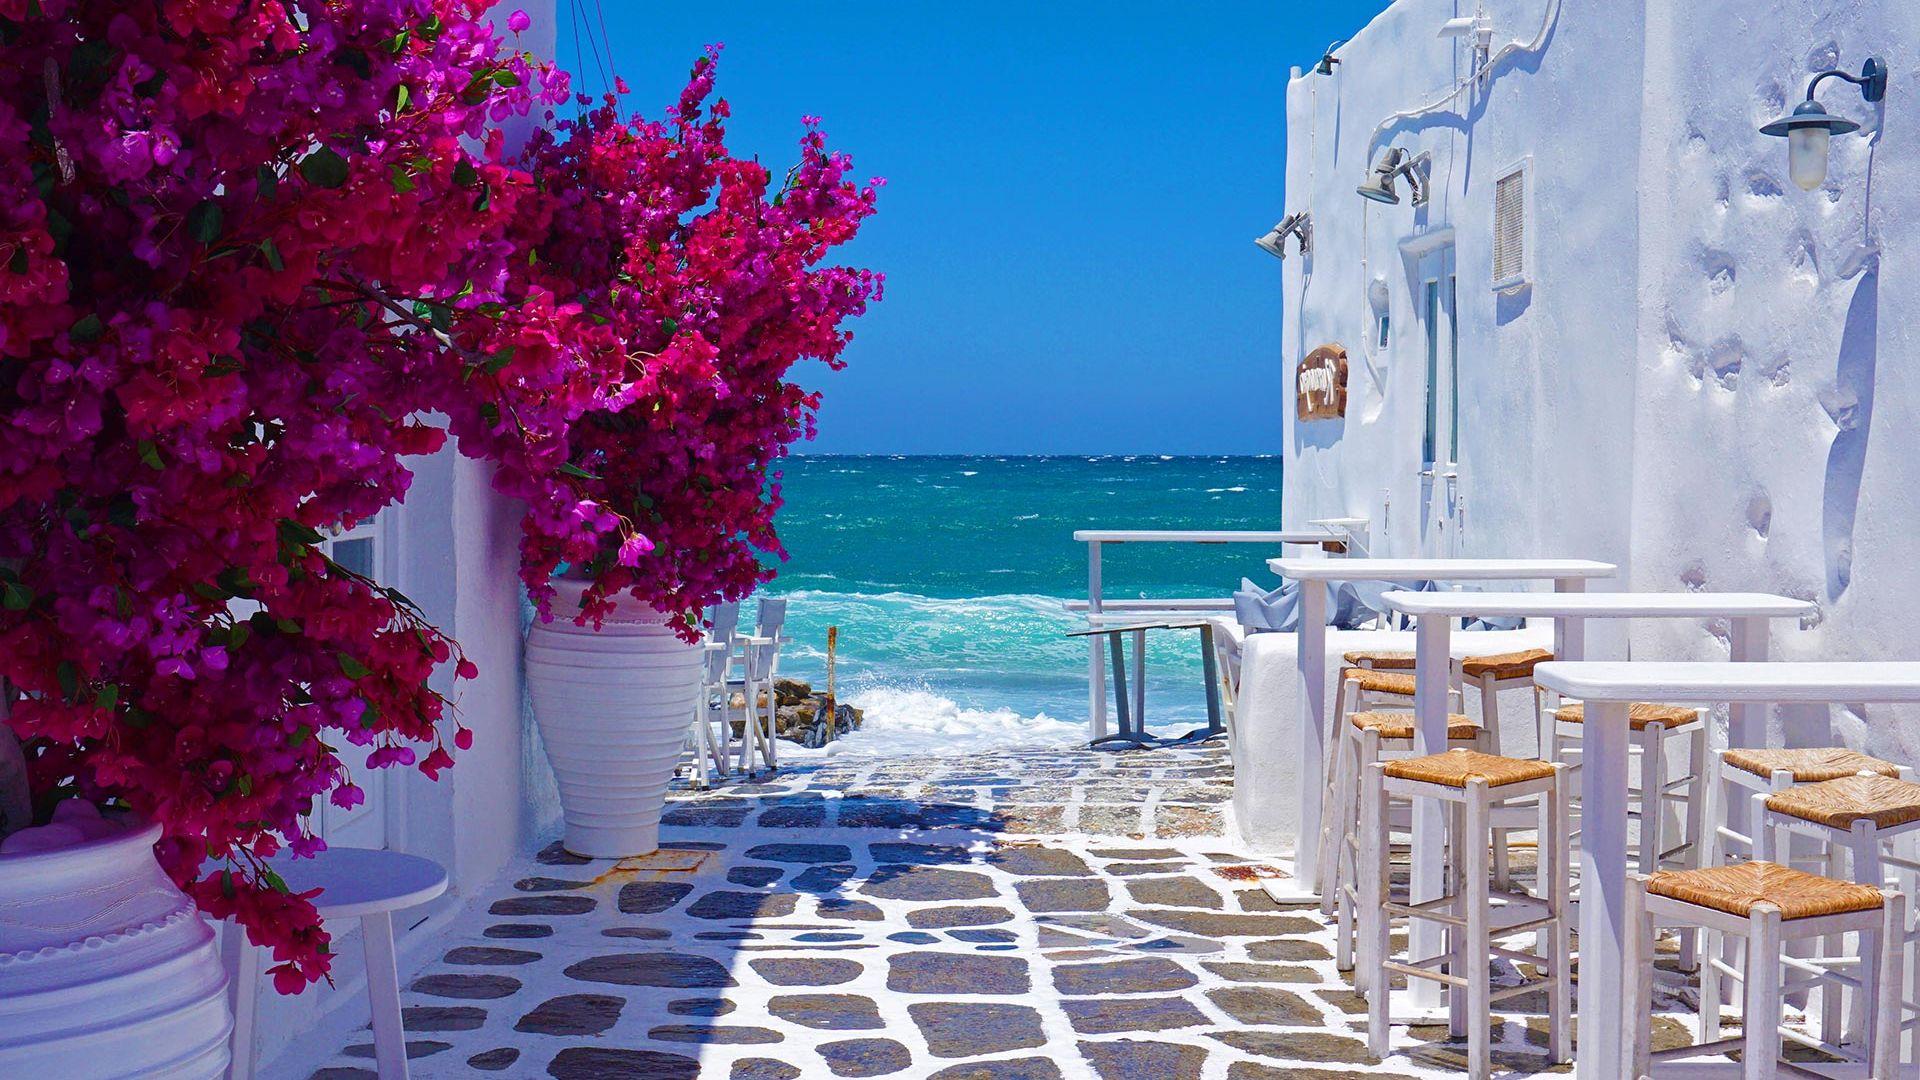 Sejur plaja Mykonos, Grecia, august, 8 zile